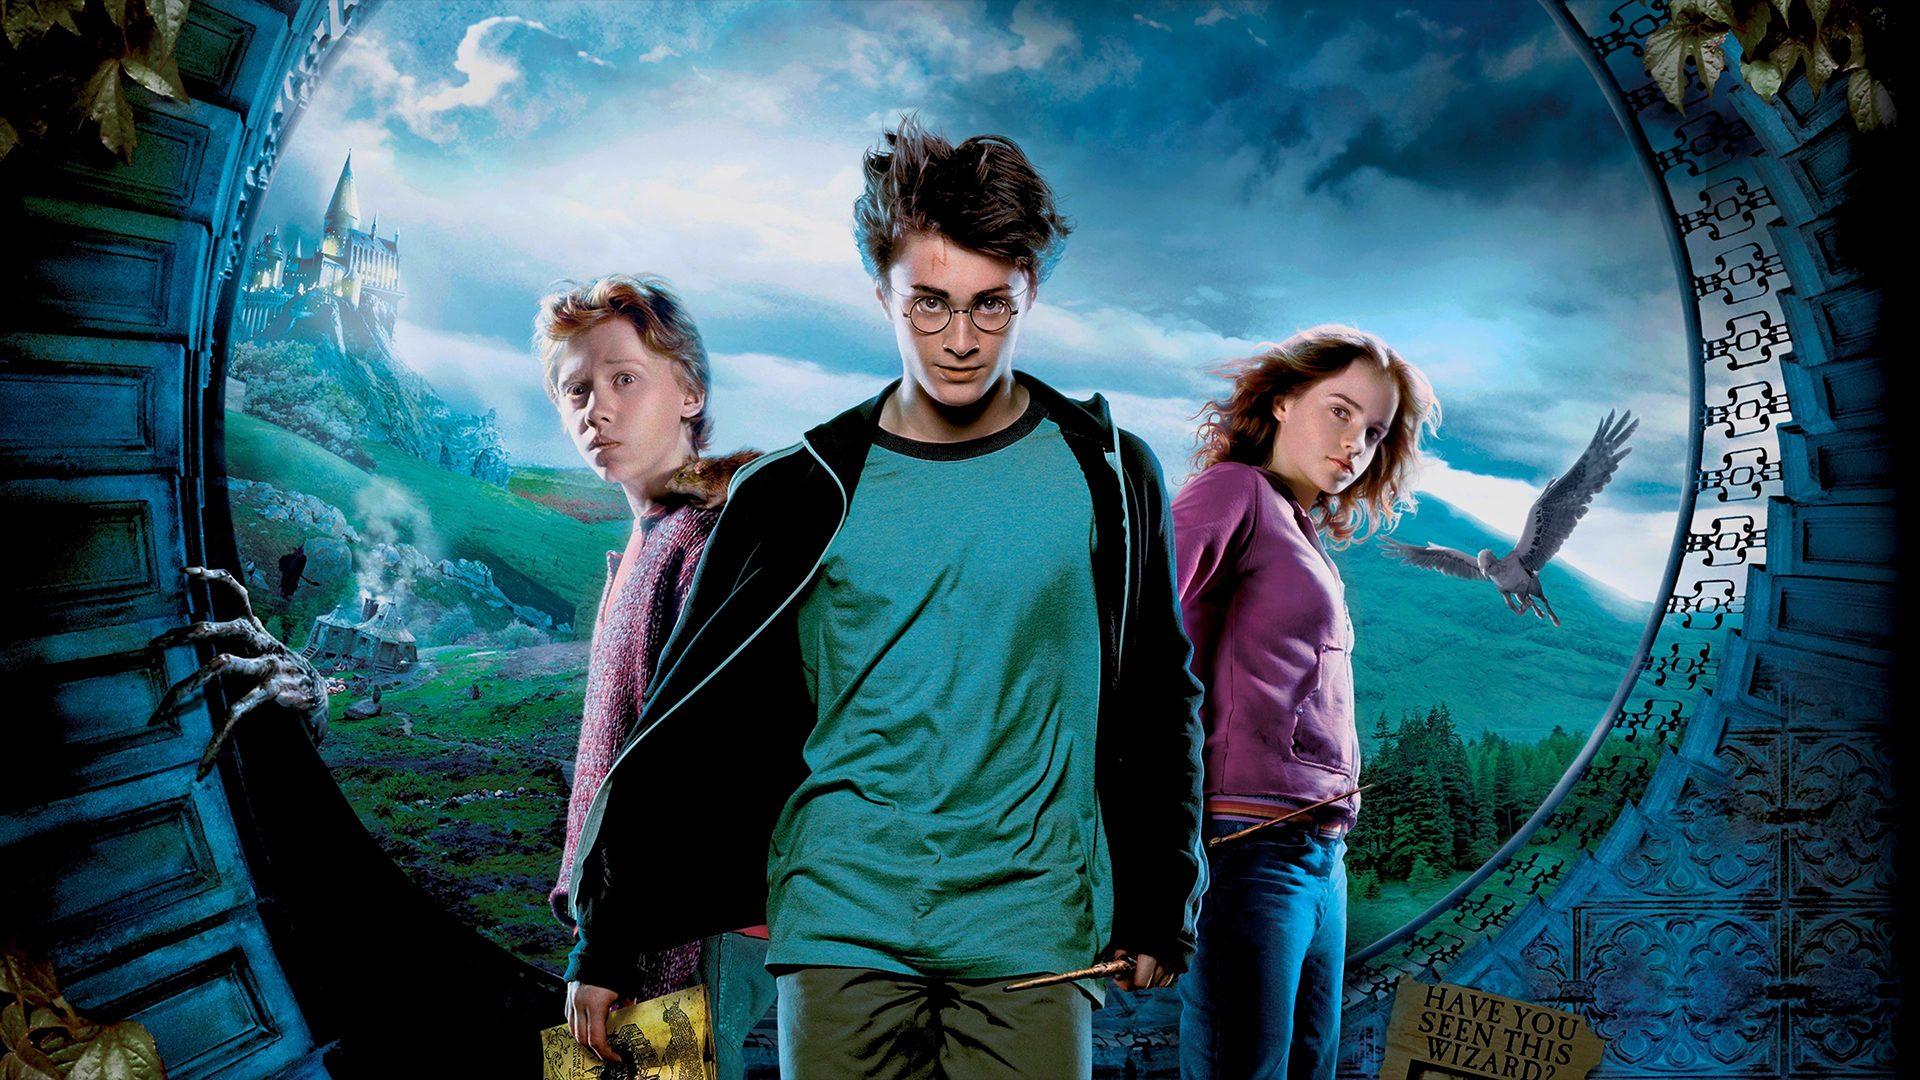 Ongebruikt Harry Potter and the Prisoner of Azkaban - Pathé Thuis FB-94